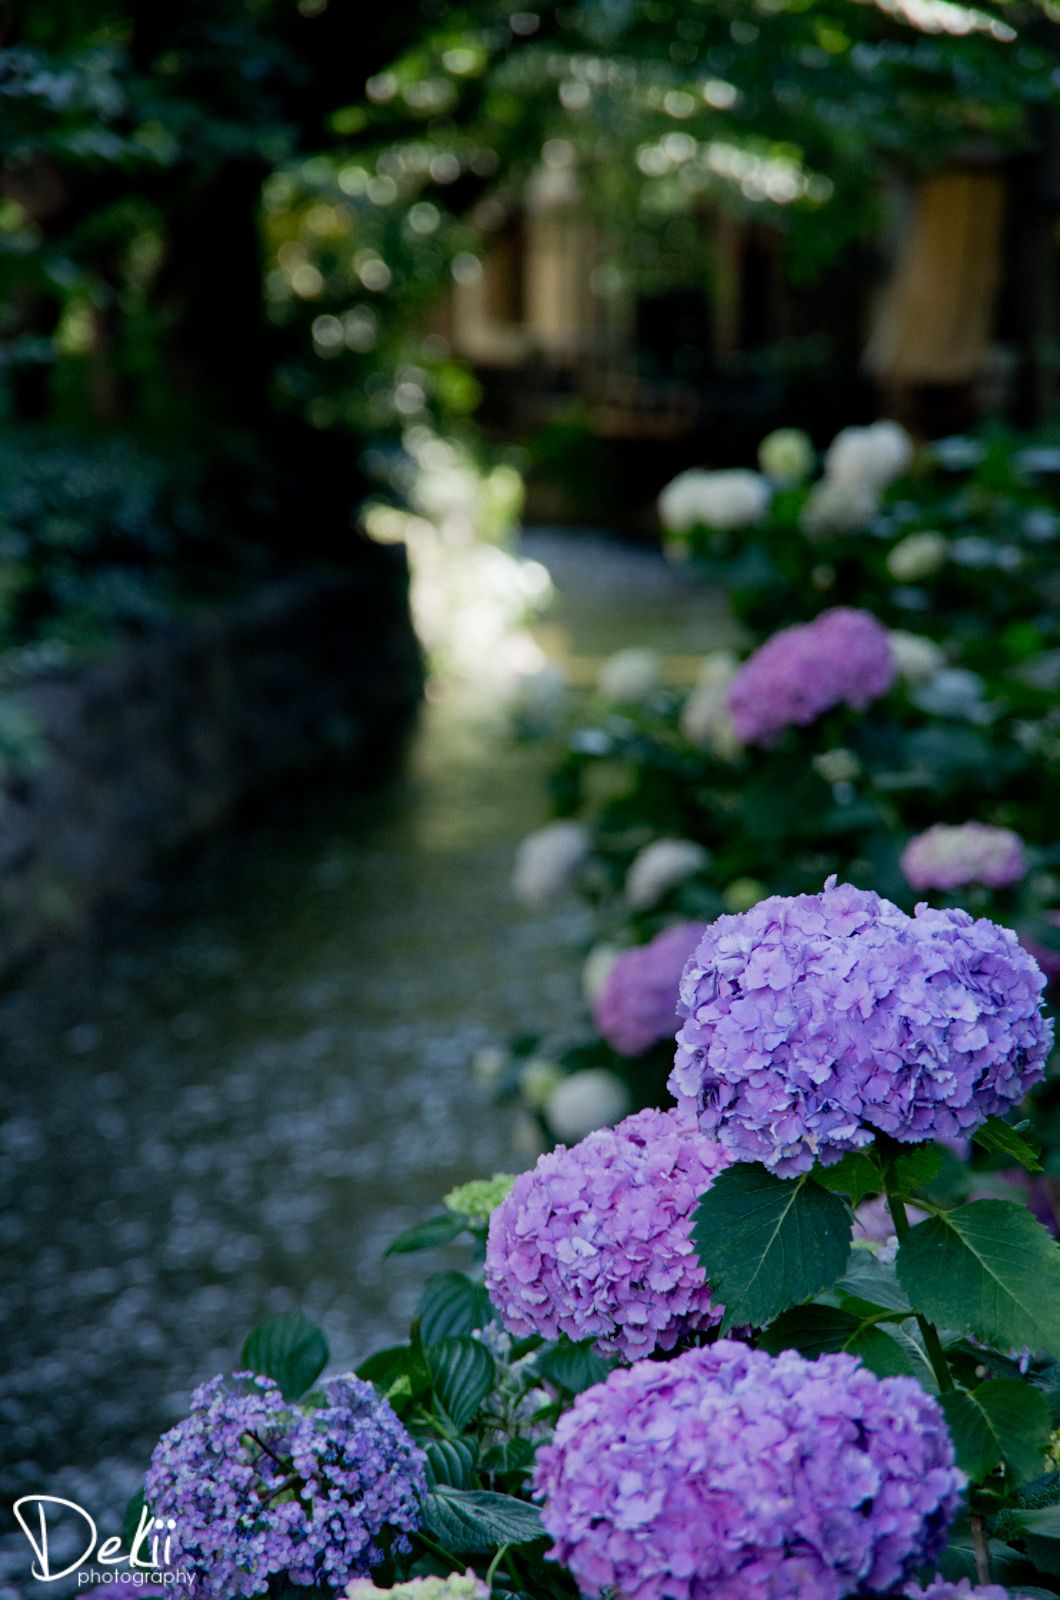 https://flic.kr/p/crqaPu | Million Flowers | PENTAX K-5, smc PENTAX-DA 18-135mmF3.5-5.6ED AL DC WR Ajisai with Takase River, KYOTO